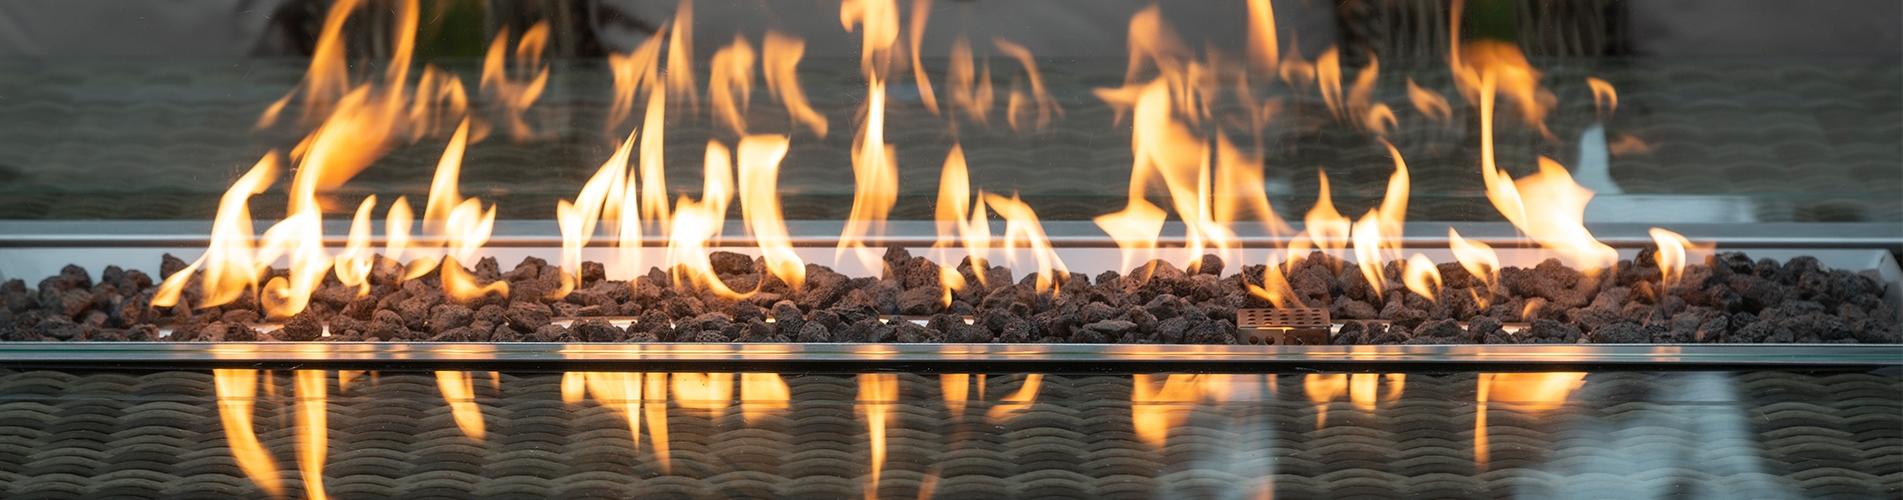 Katie Blake Fire Pit Furniture Sets